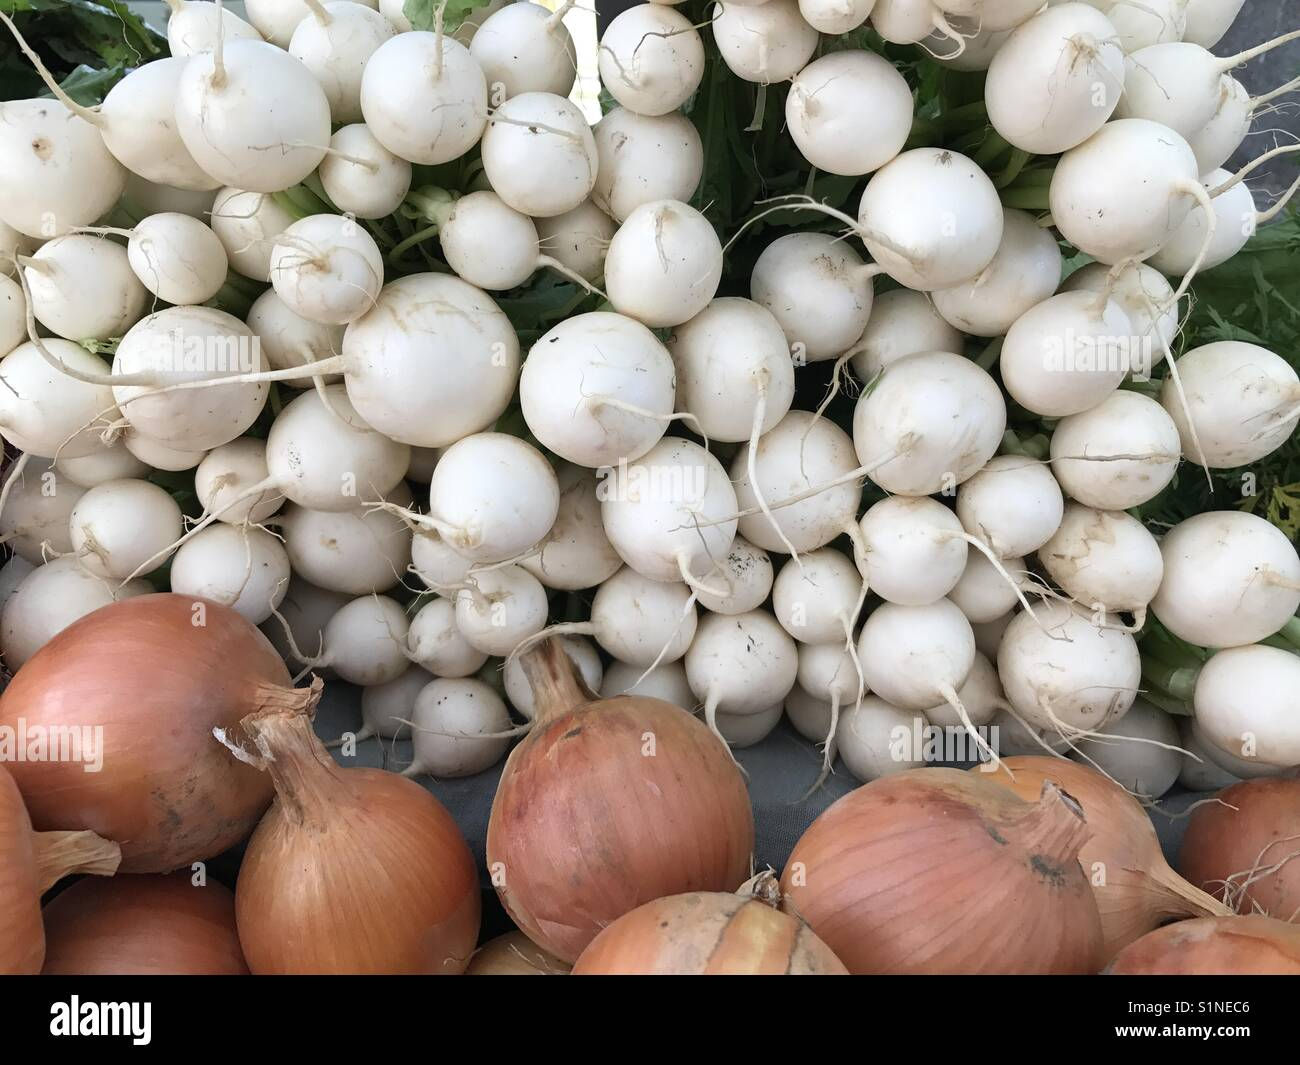 White radishes and yellow onions - Stock Image